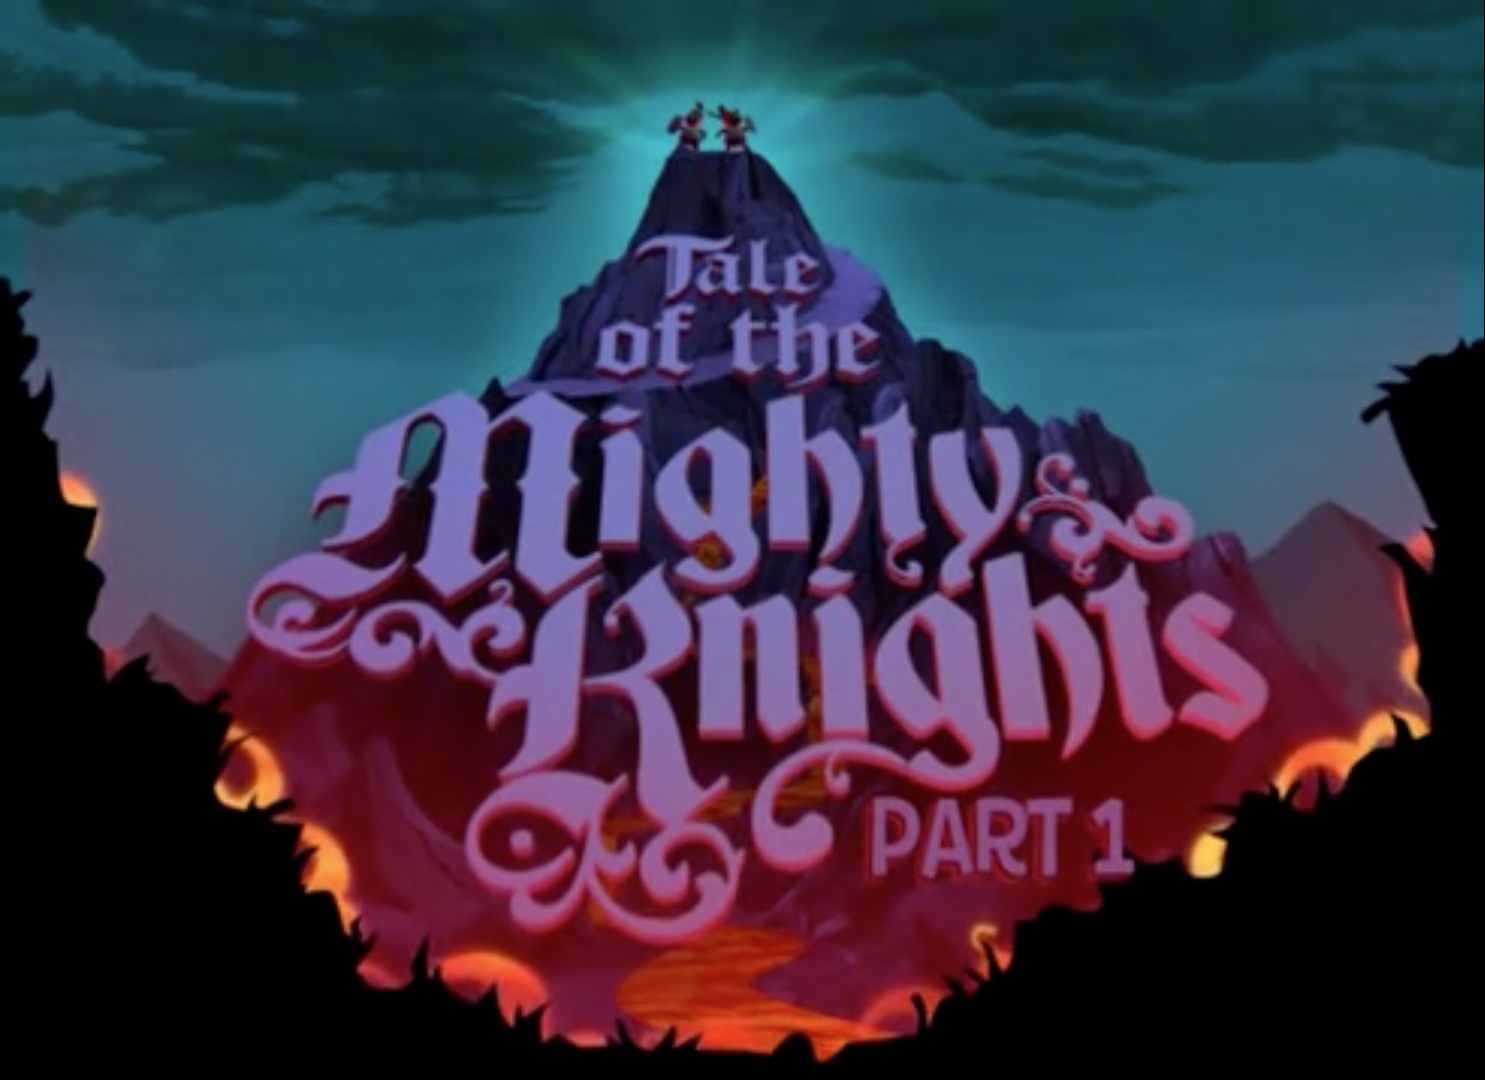 a knights tale 1 A knight's tale (2001) – hollywood movie watch online starring - heath ledger, rufus sewell, shannyn sossamon, paul bettany director - brian helgeland genre - action, romance movie info .